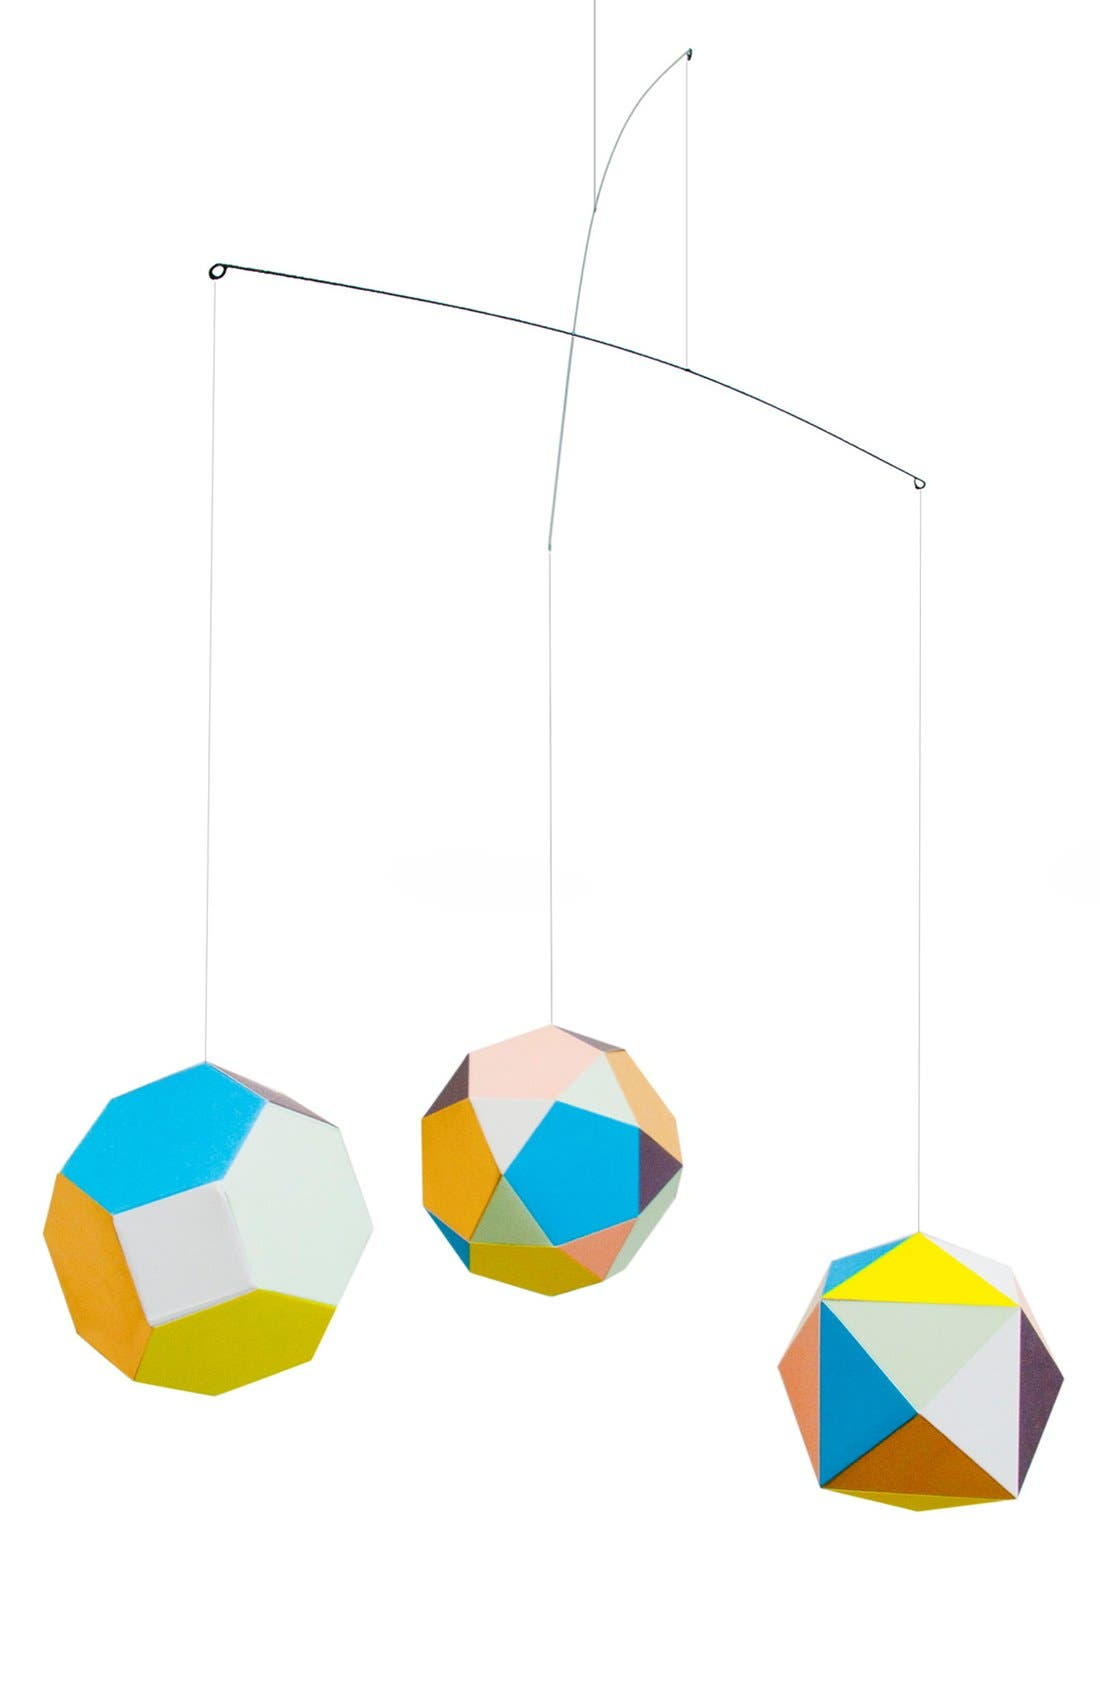 Alternate Image 1 Selected - Artecnica® 'Themis Trio' Mobile